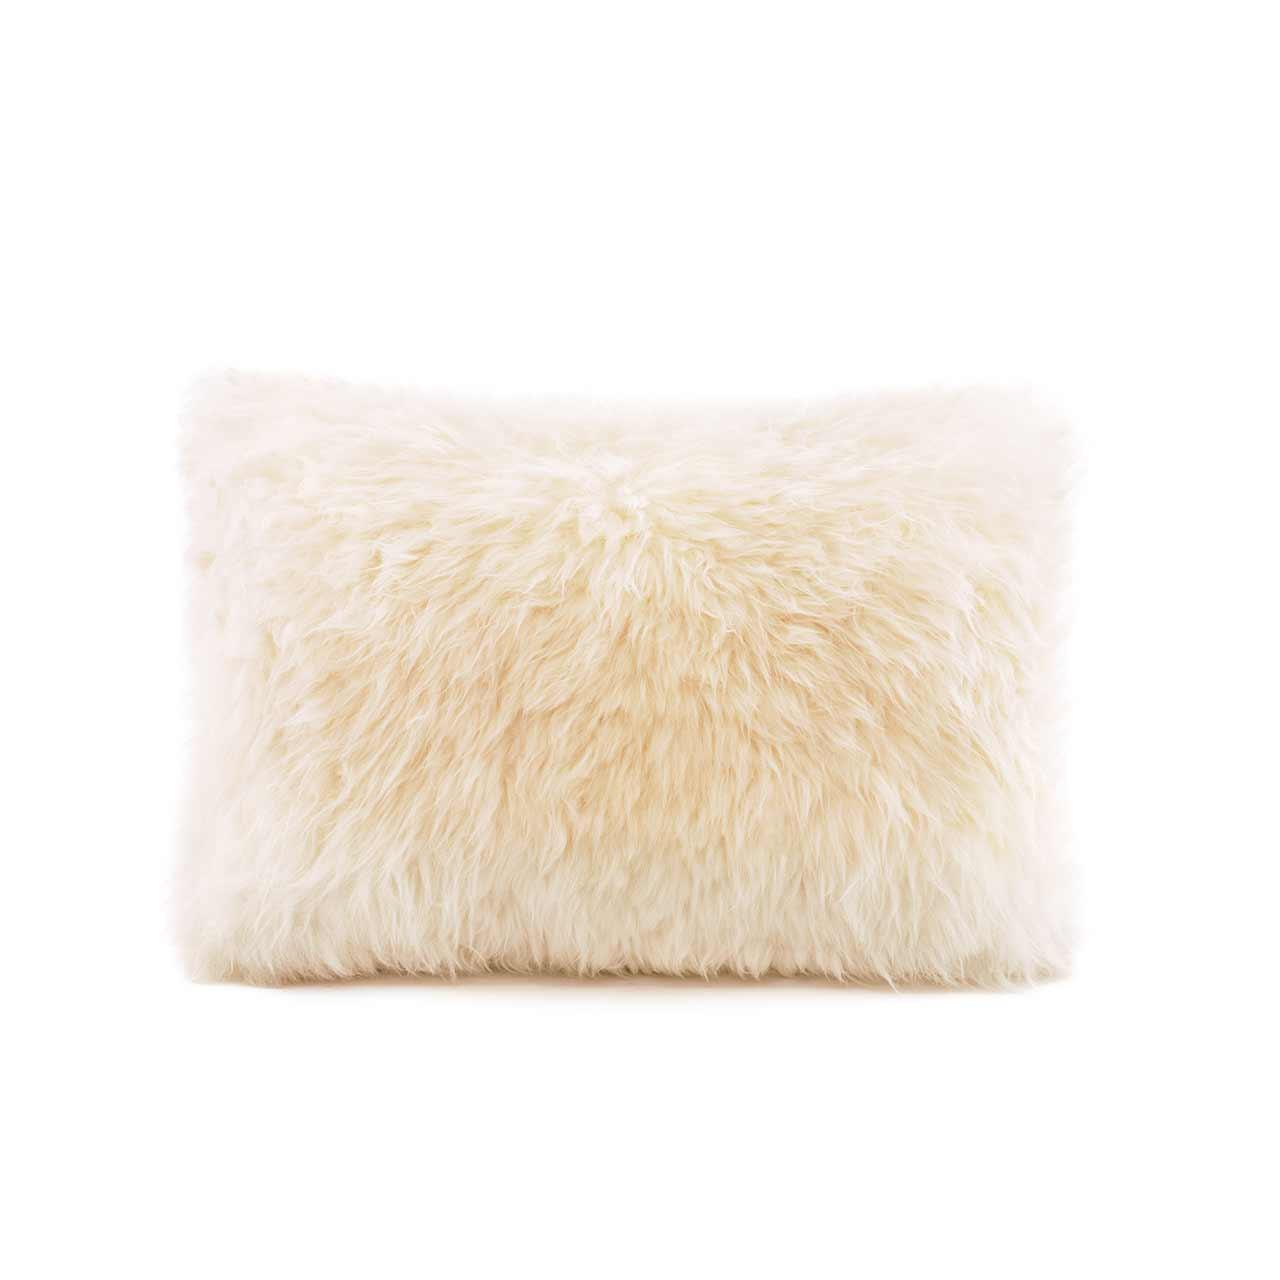 woola_long_wool_sheepskin_cushion_natural_rectangle